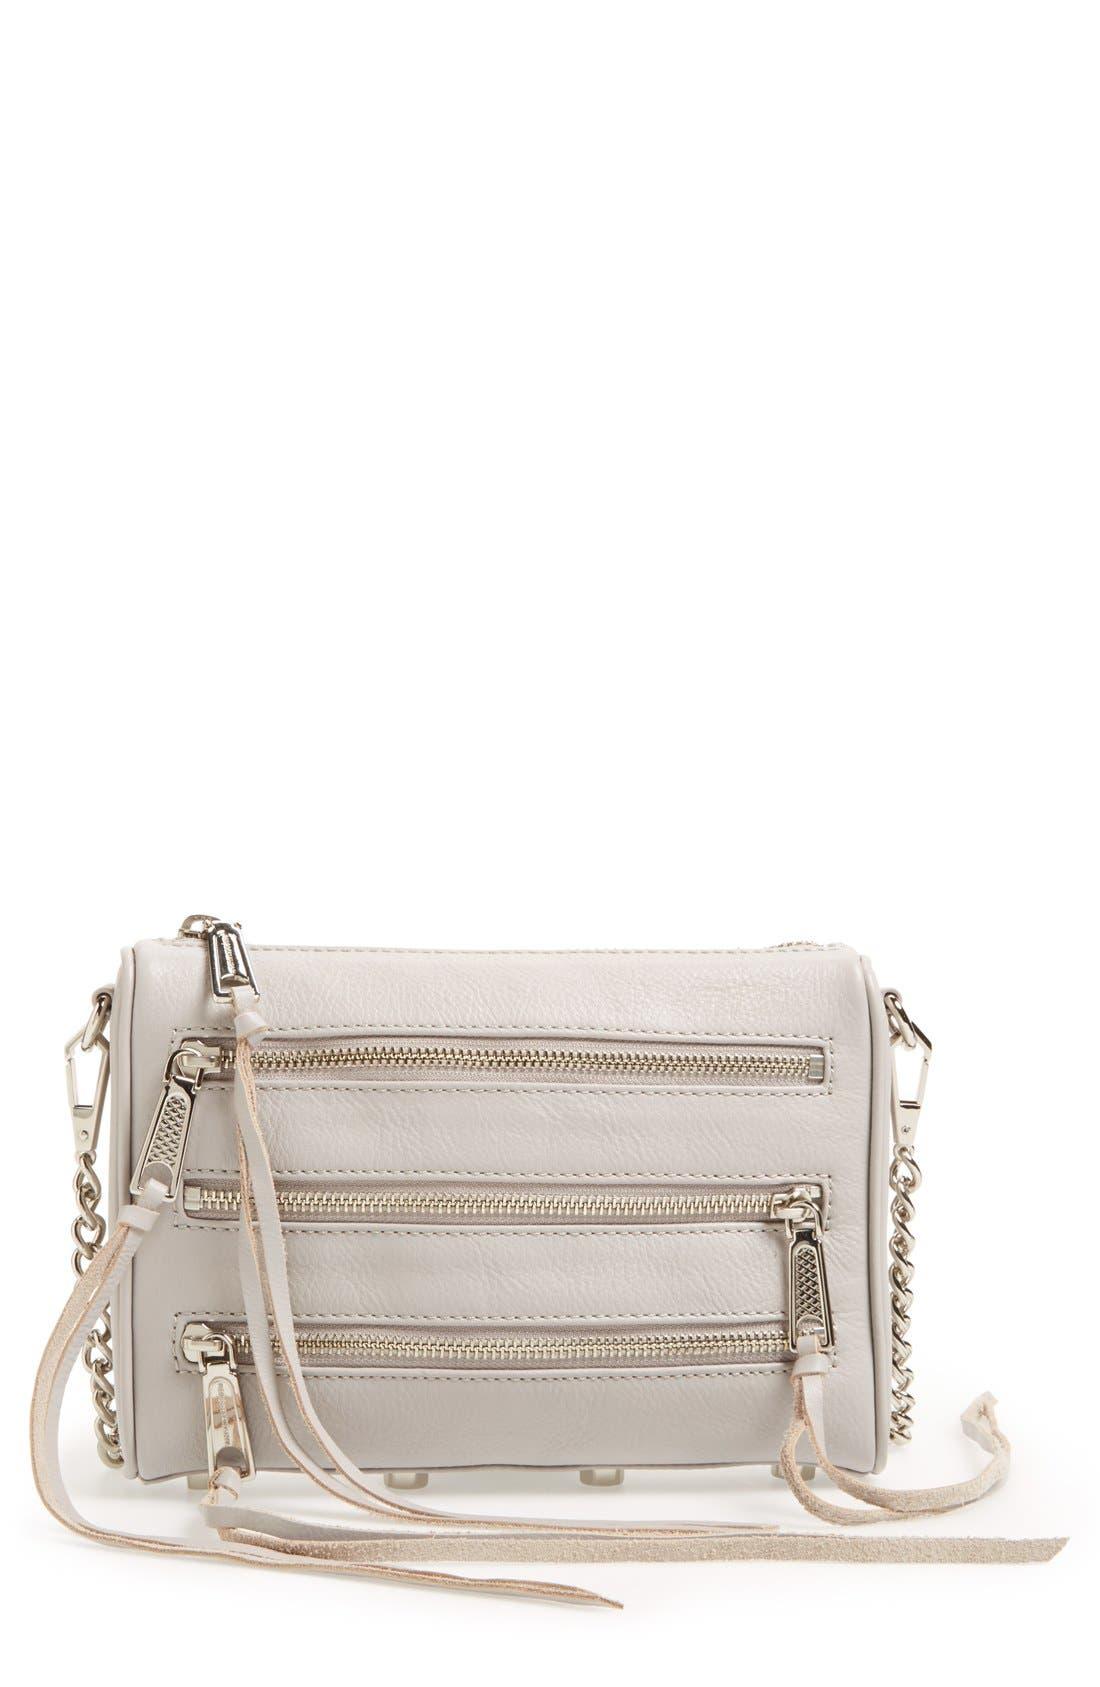 Alternate Image 1 Selected - Rebecca Minkoff Mini 5 Zip Convertible Crossbody Bag